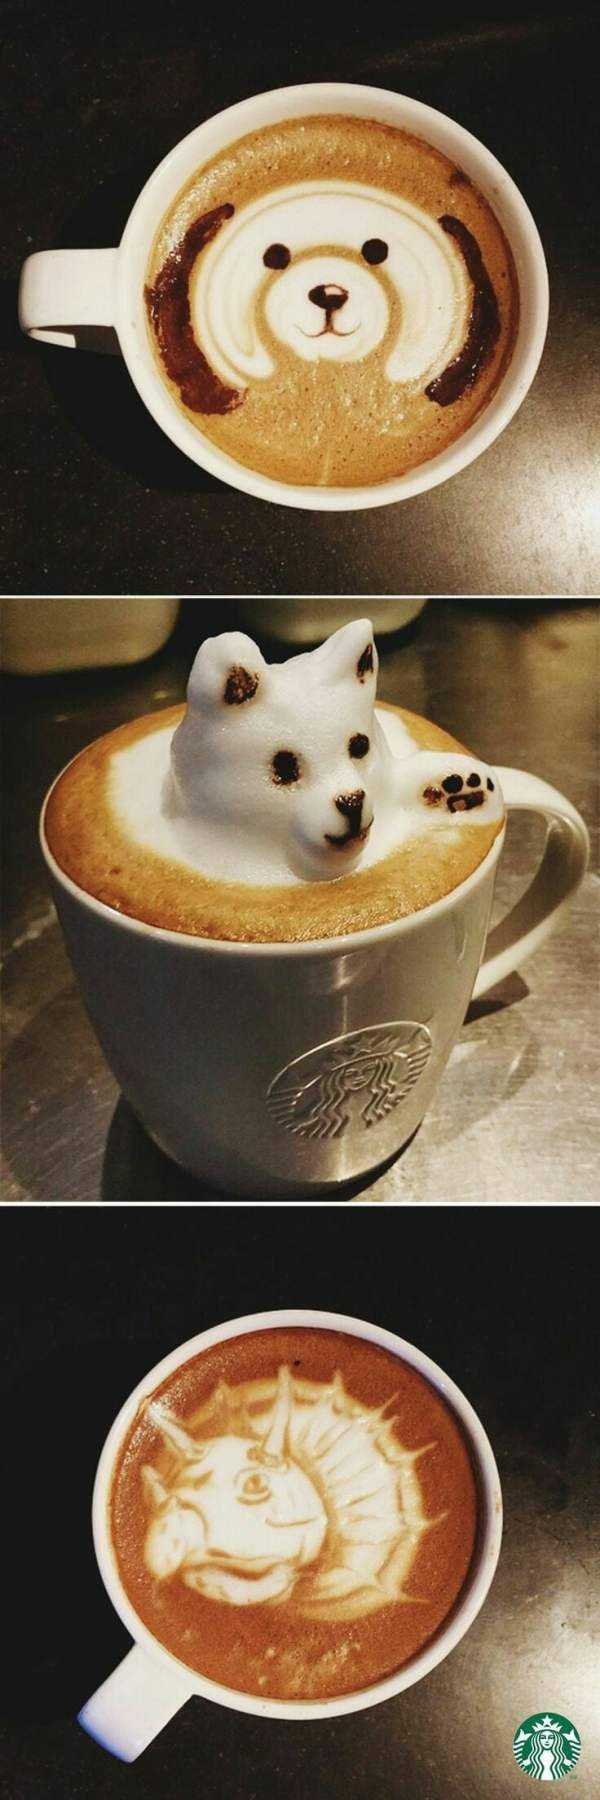 impressive-latte-art (4)